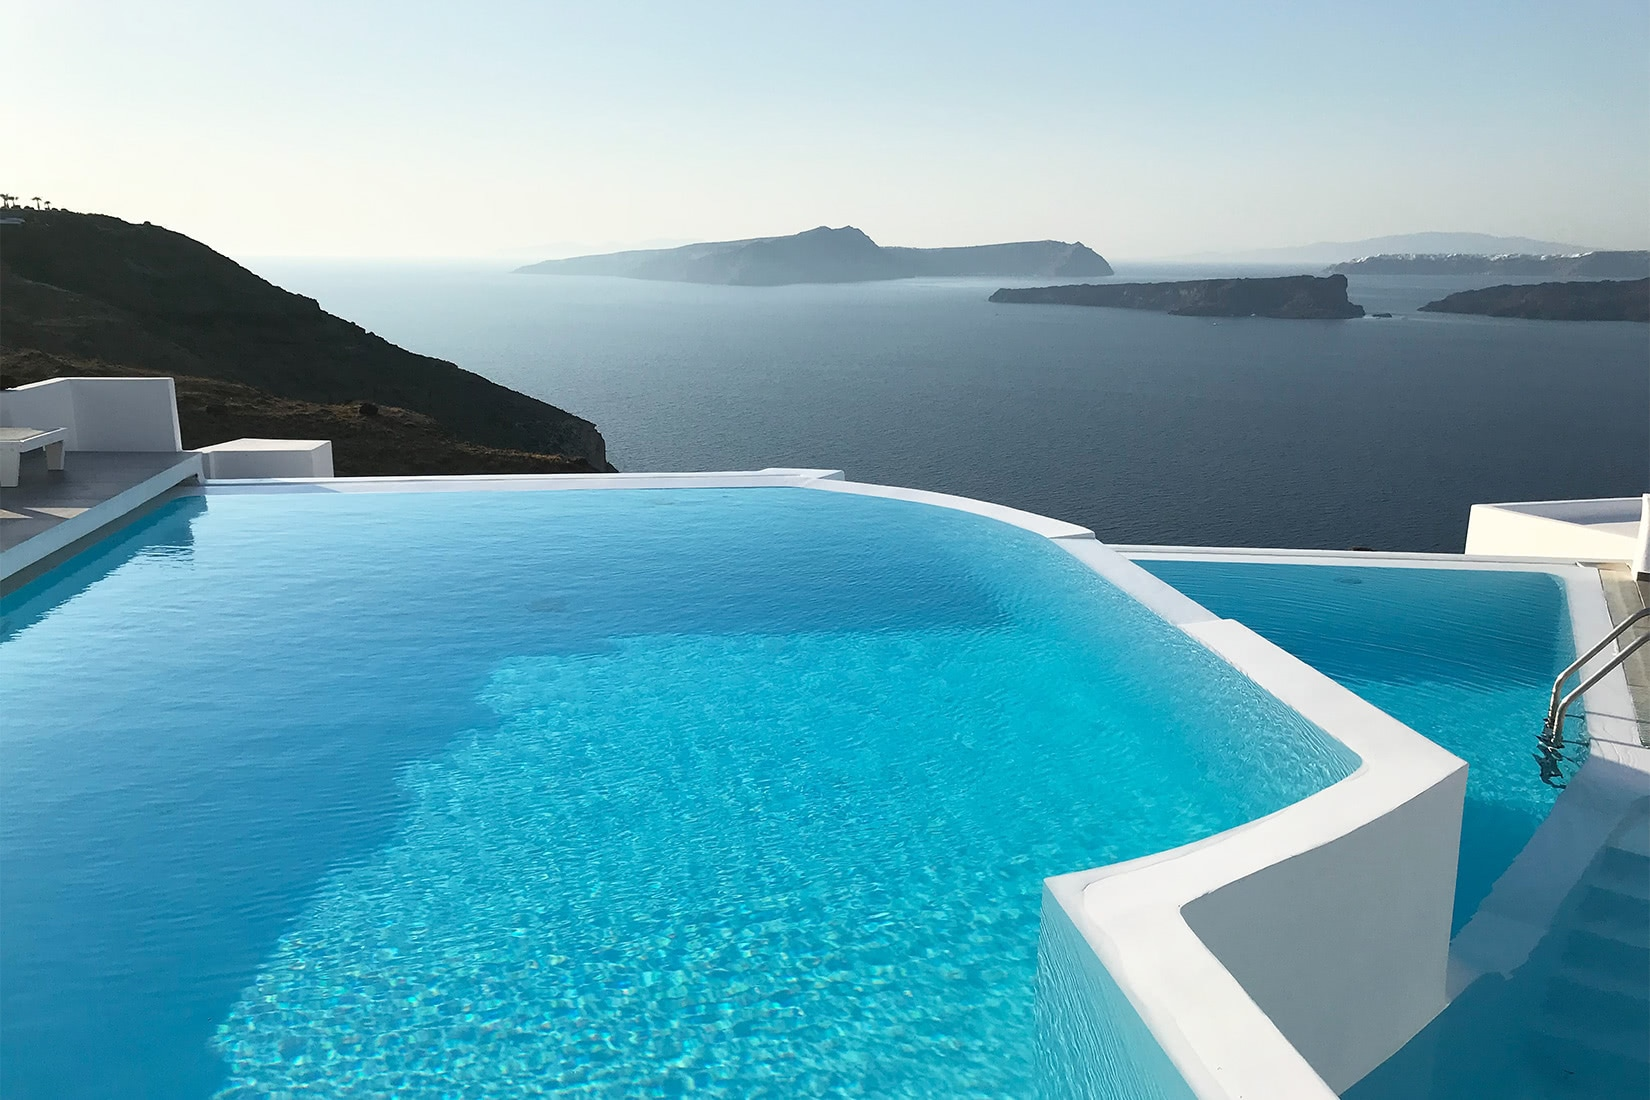 real estate investing greece oceanview villa dream estates advisor luxe digital